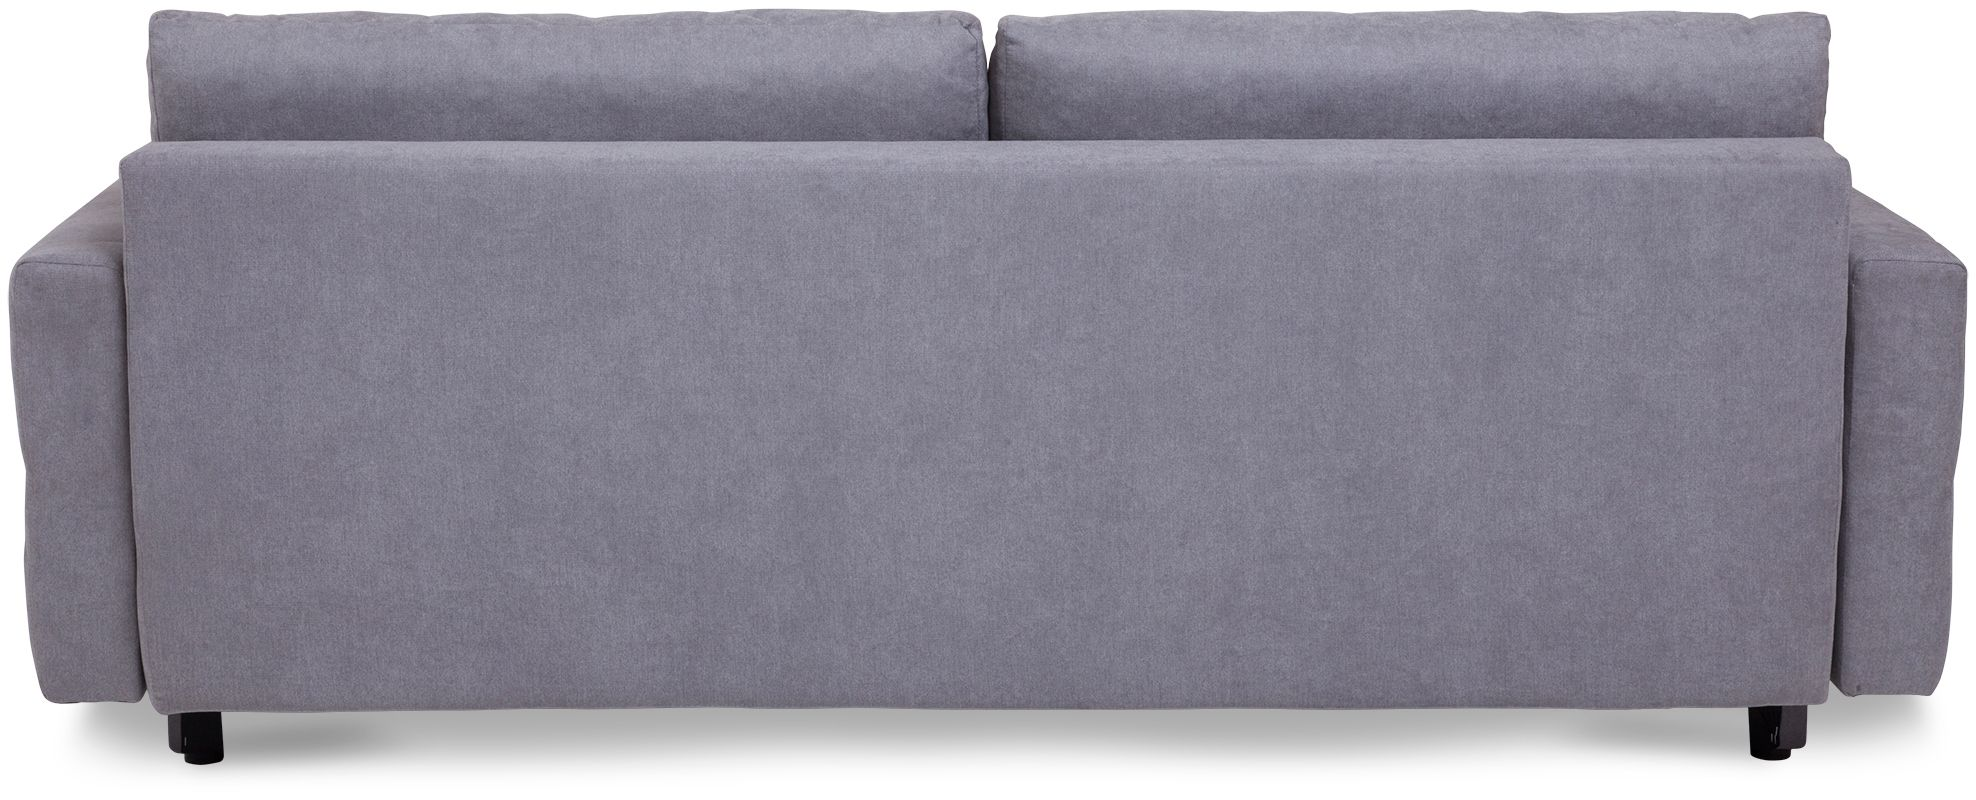 sofa alba 12